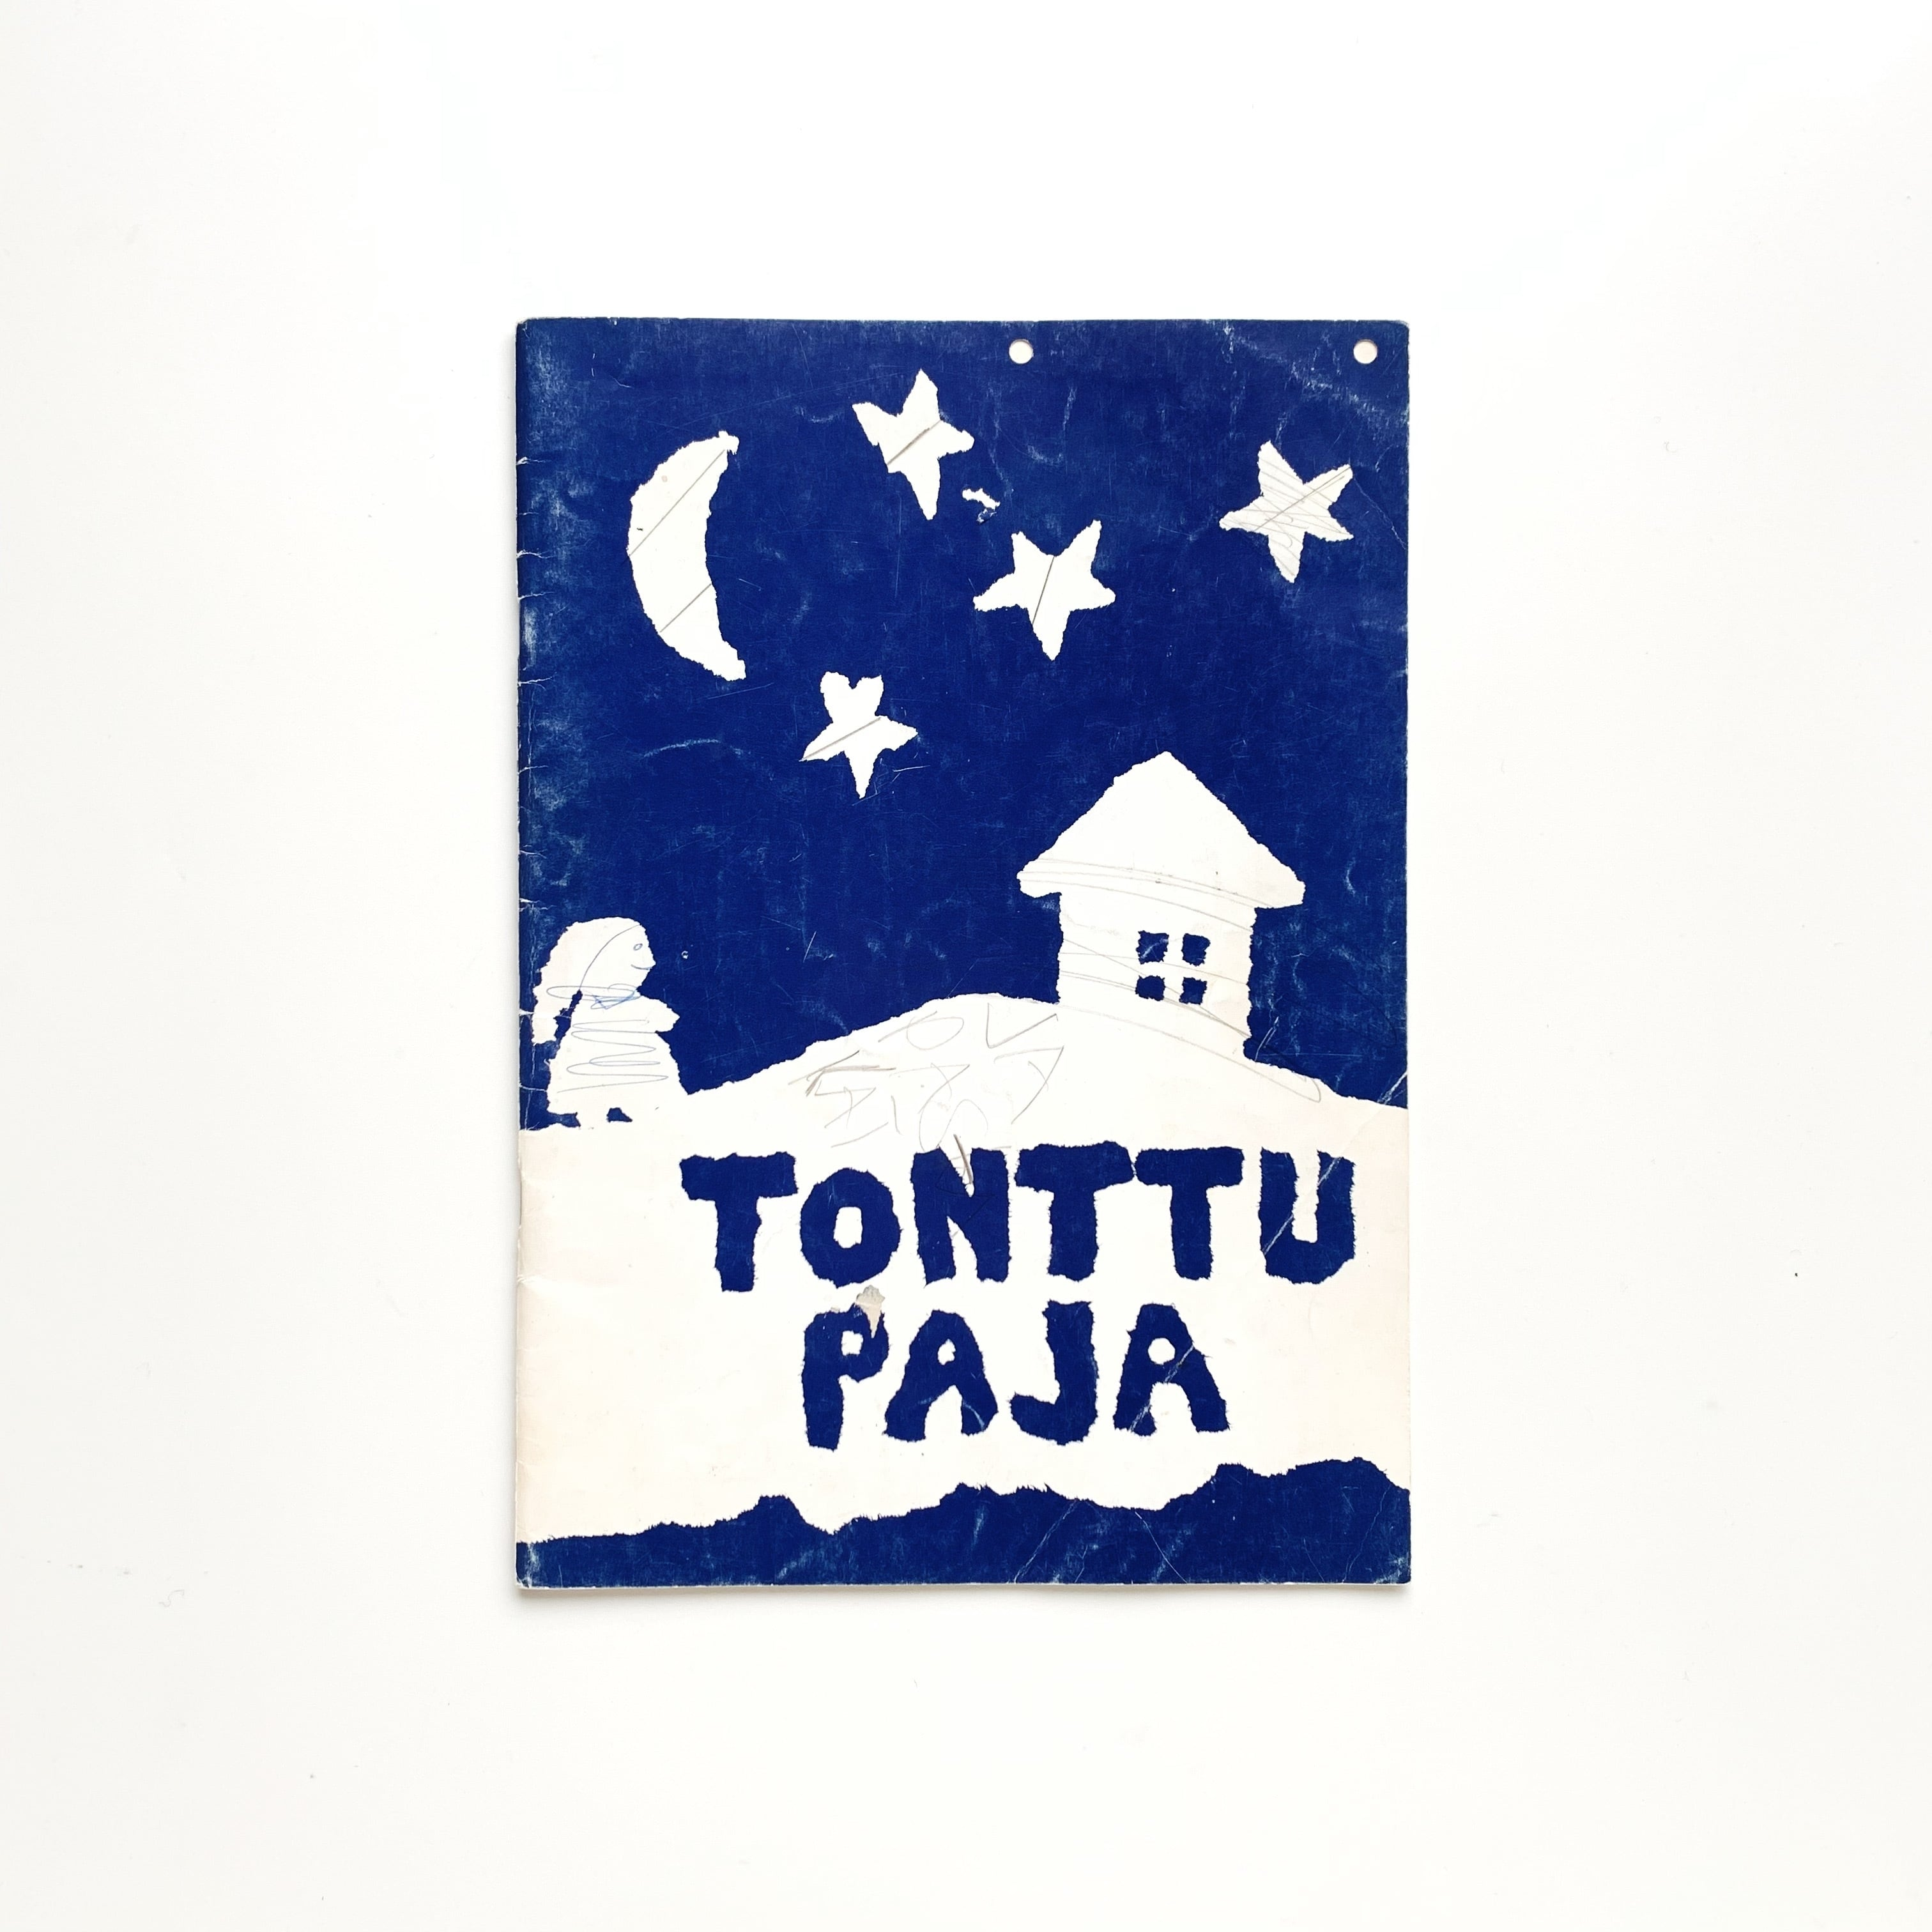 TONTTU PAJA